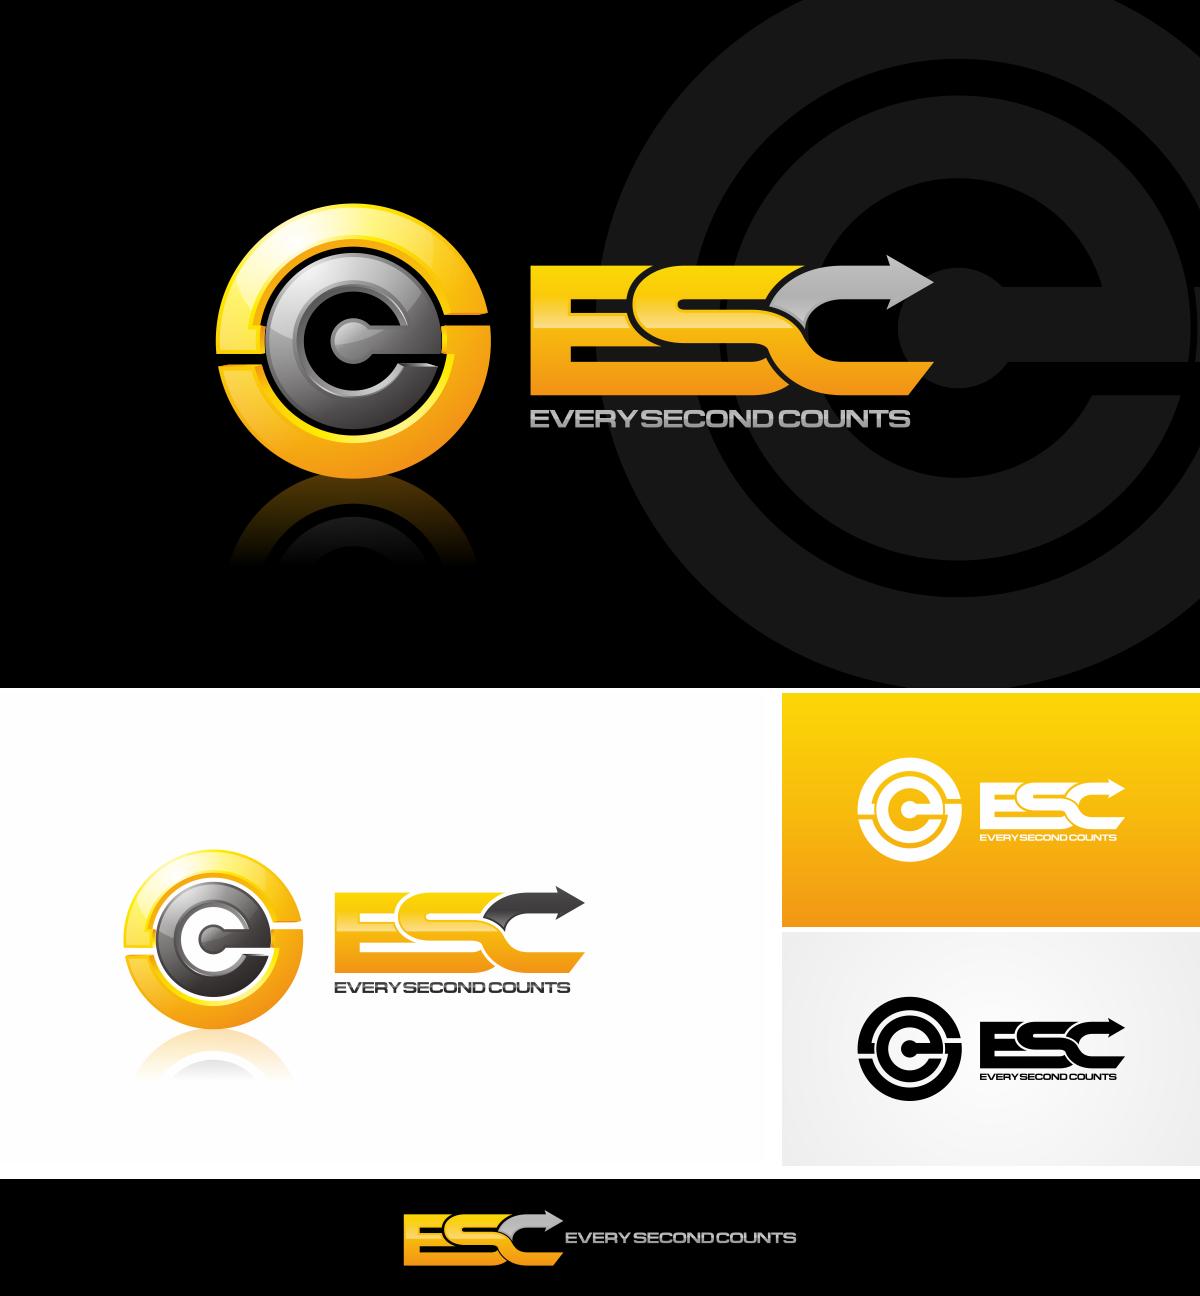 Help ESC with a new logo